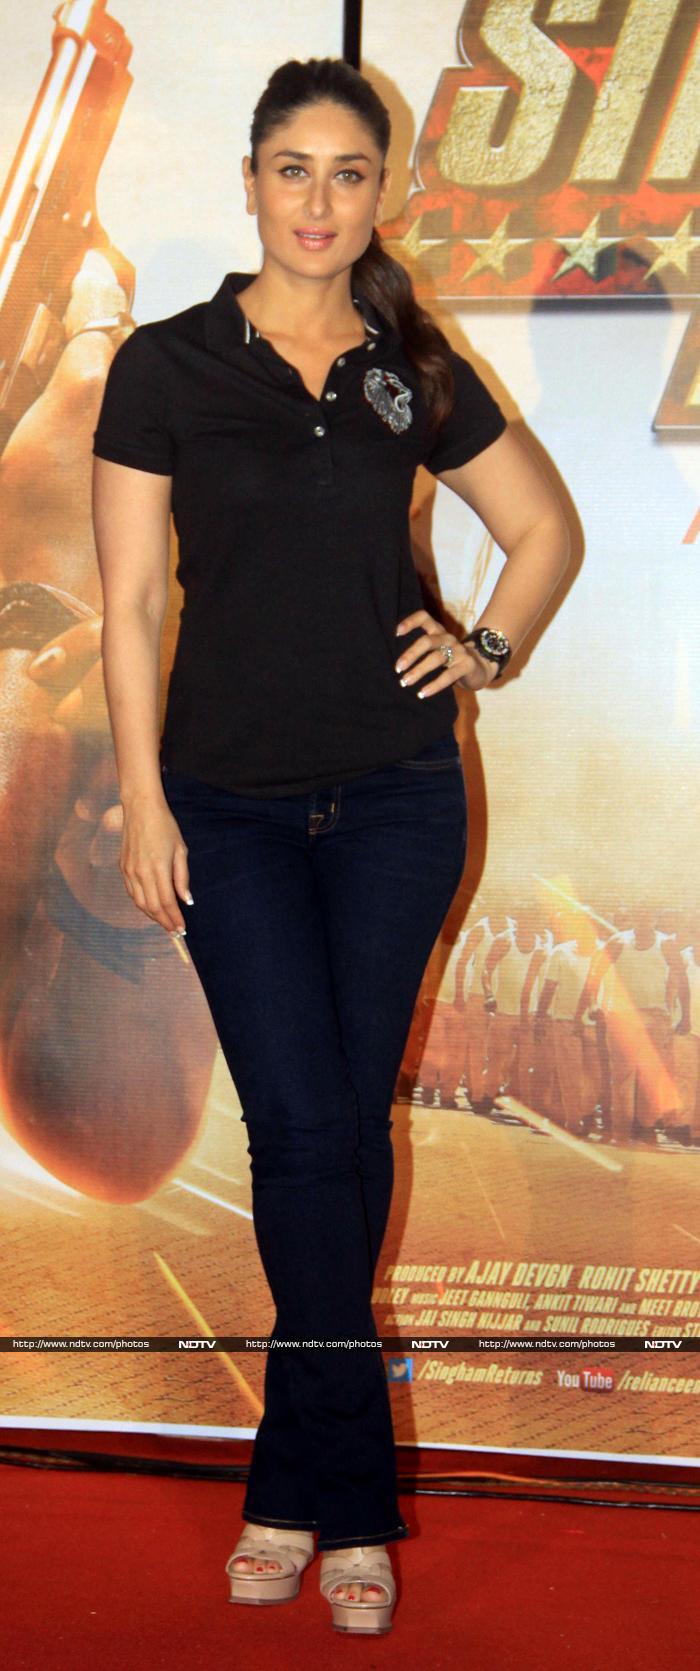 Singham Returns To Roar: Ajay, Kareena, Rohit